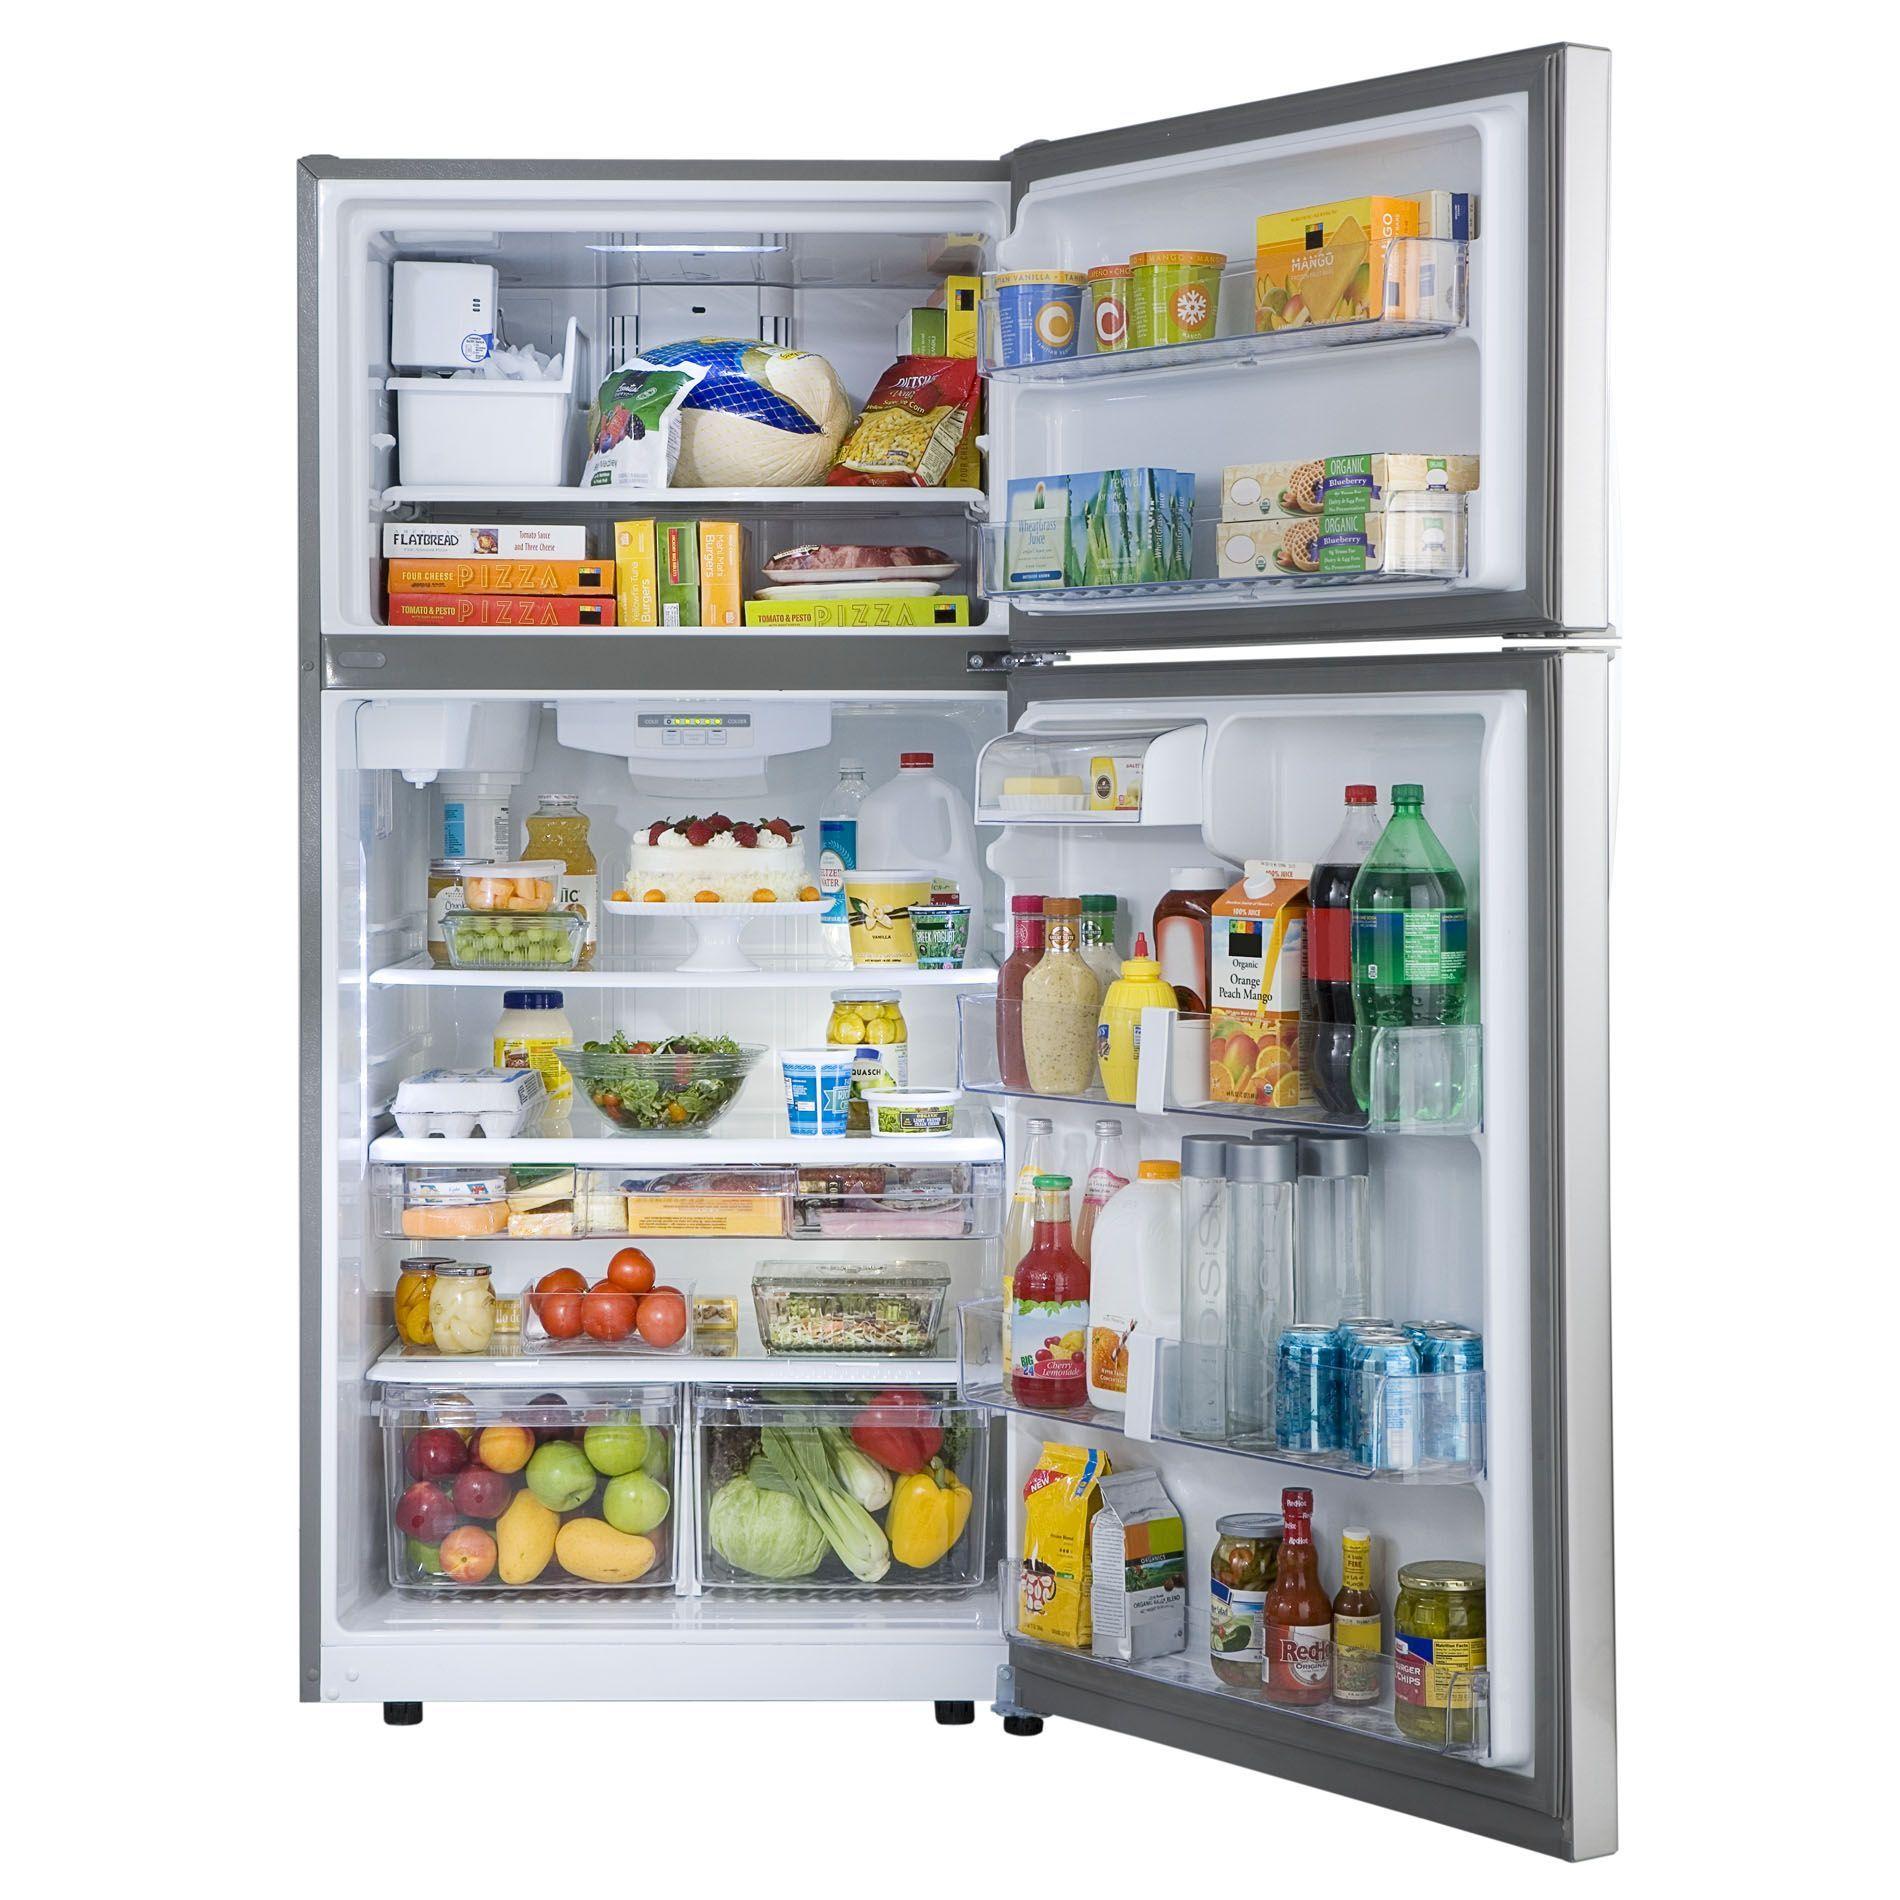 Kenmore 79433 23 8 Cu Ft Top Freezer Refrigerator W Internal Water Dispenser Stainless In 2020 Top Freezer Refrigerator Refrigerator Large Refrigerator